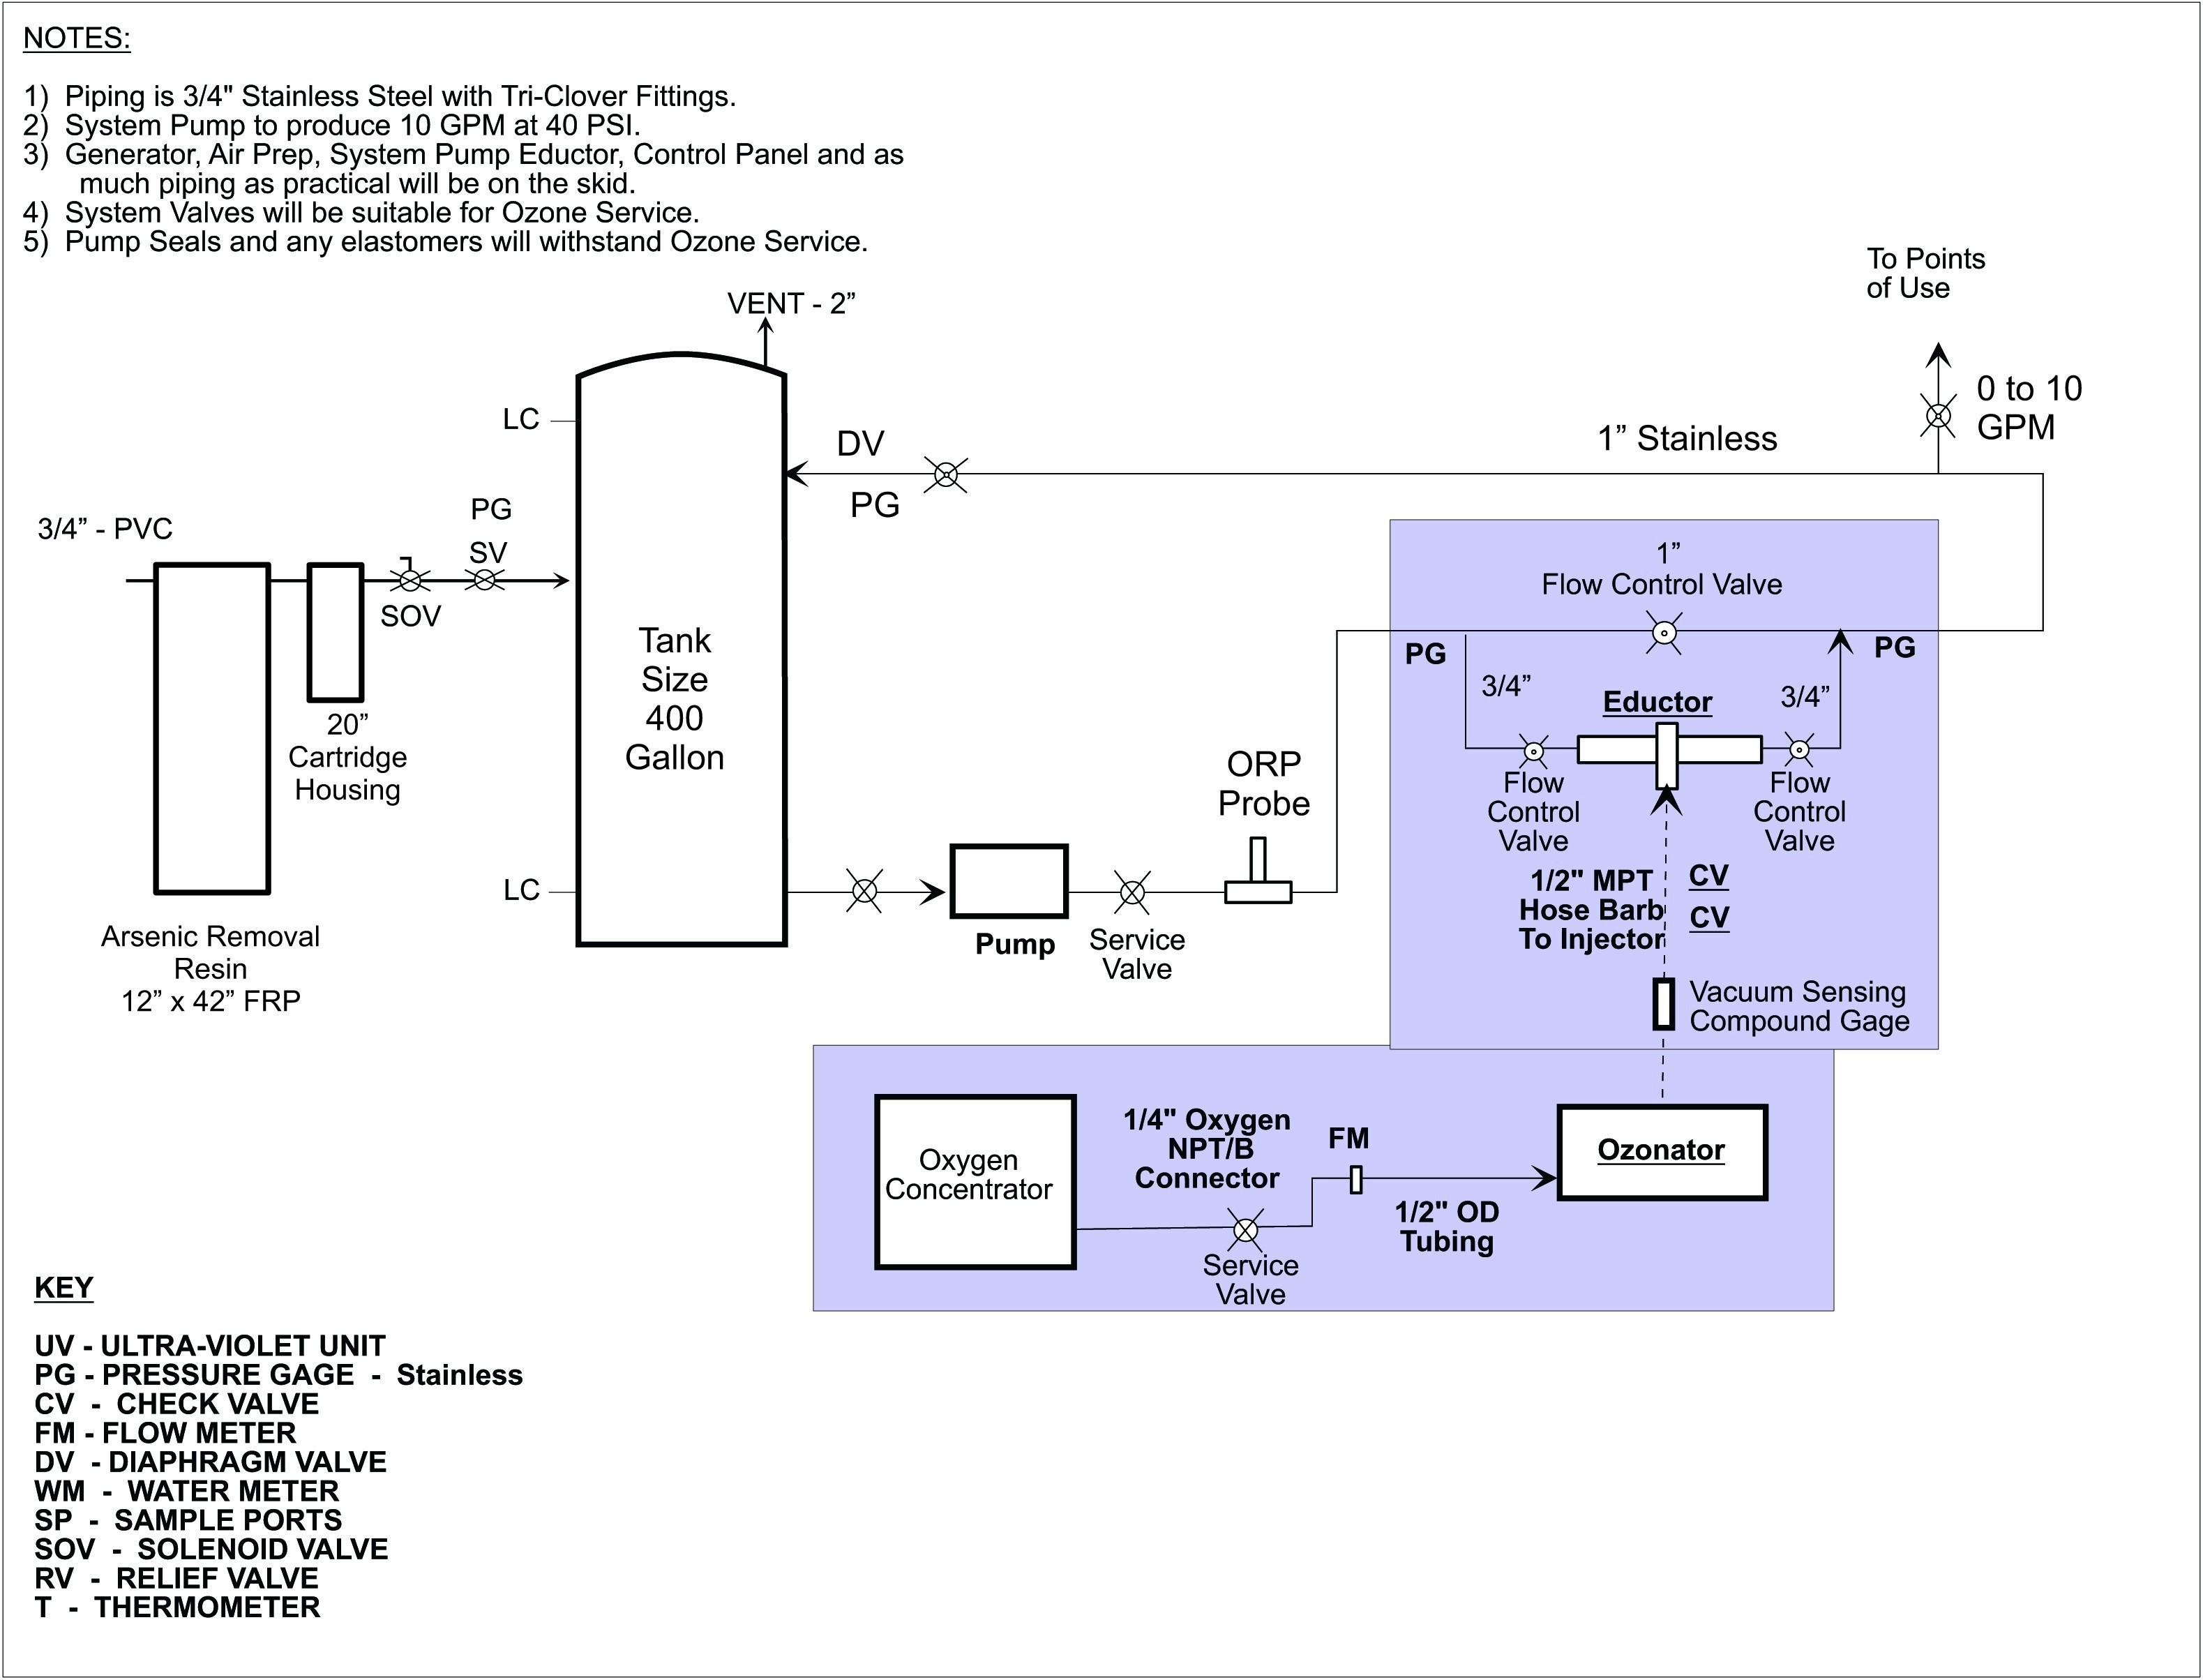 4 Guys Fire Truck Wiring Diagram - Wiring Diagram Directory  Guys Fire Truck Wiring Diagram on